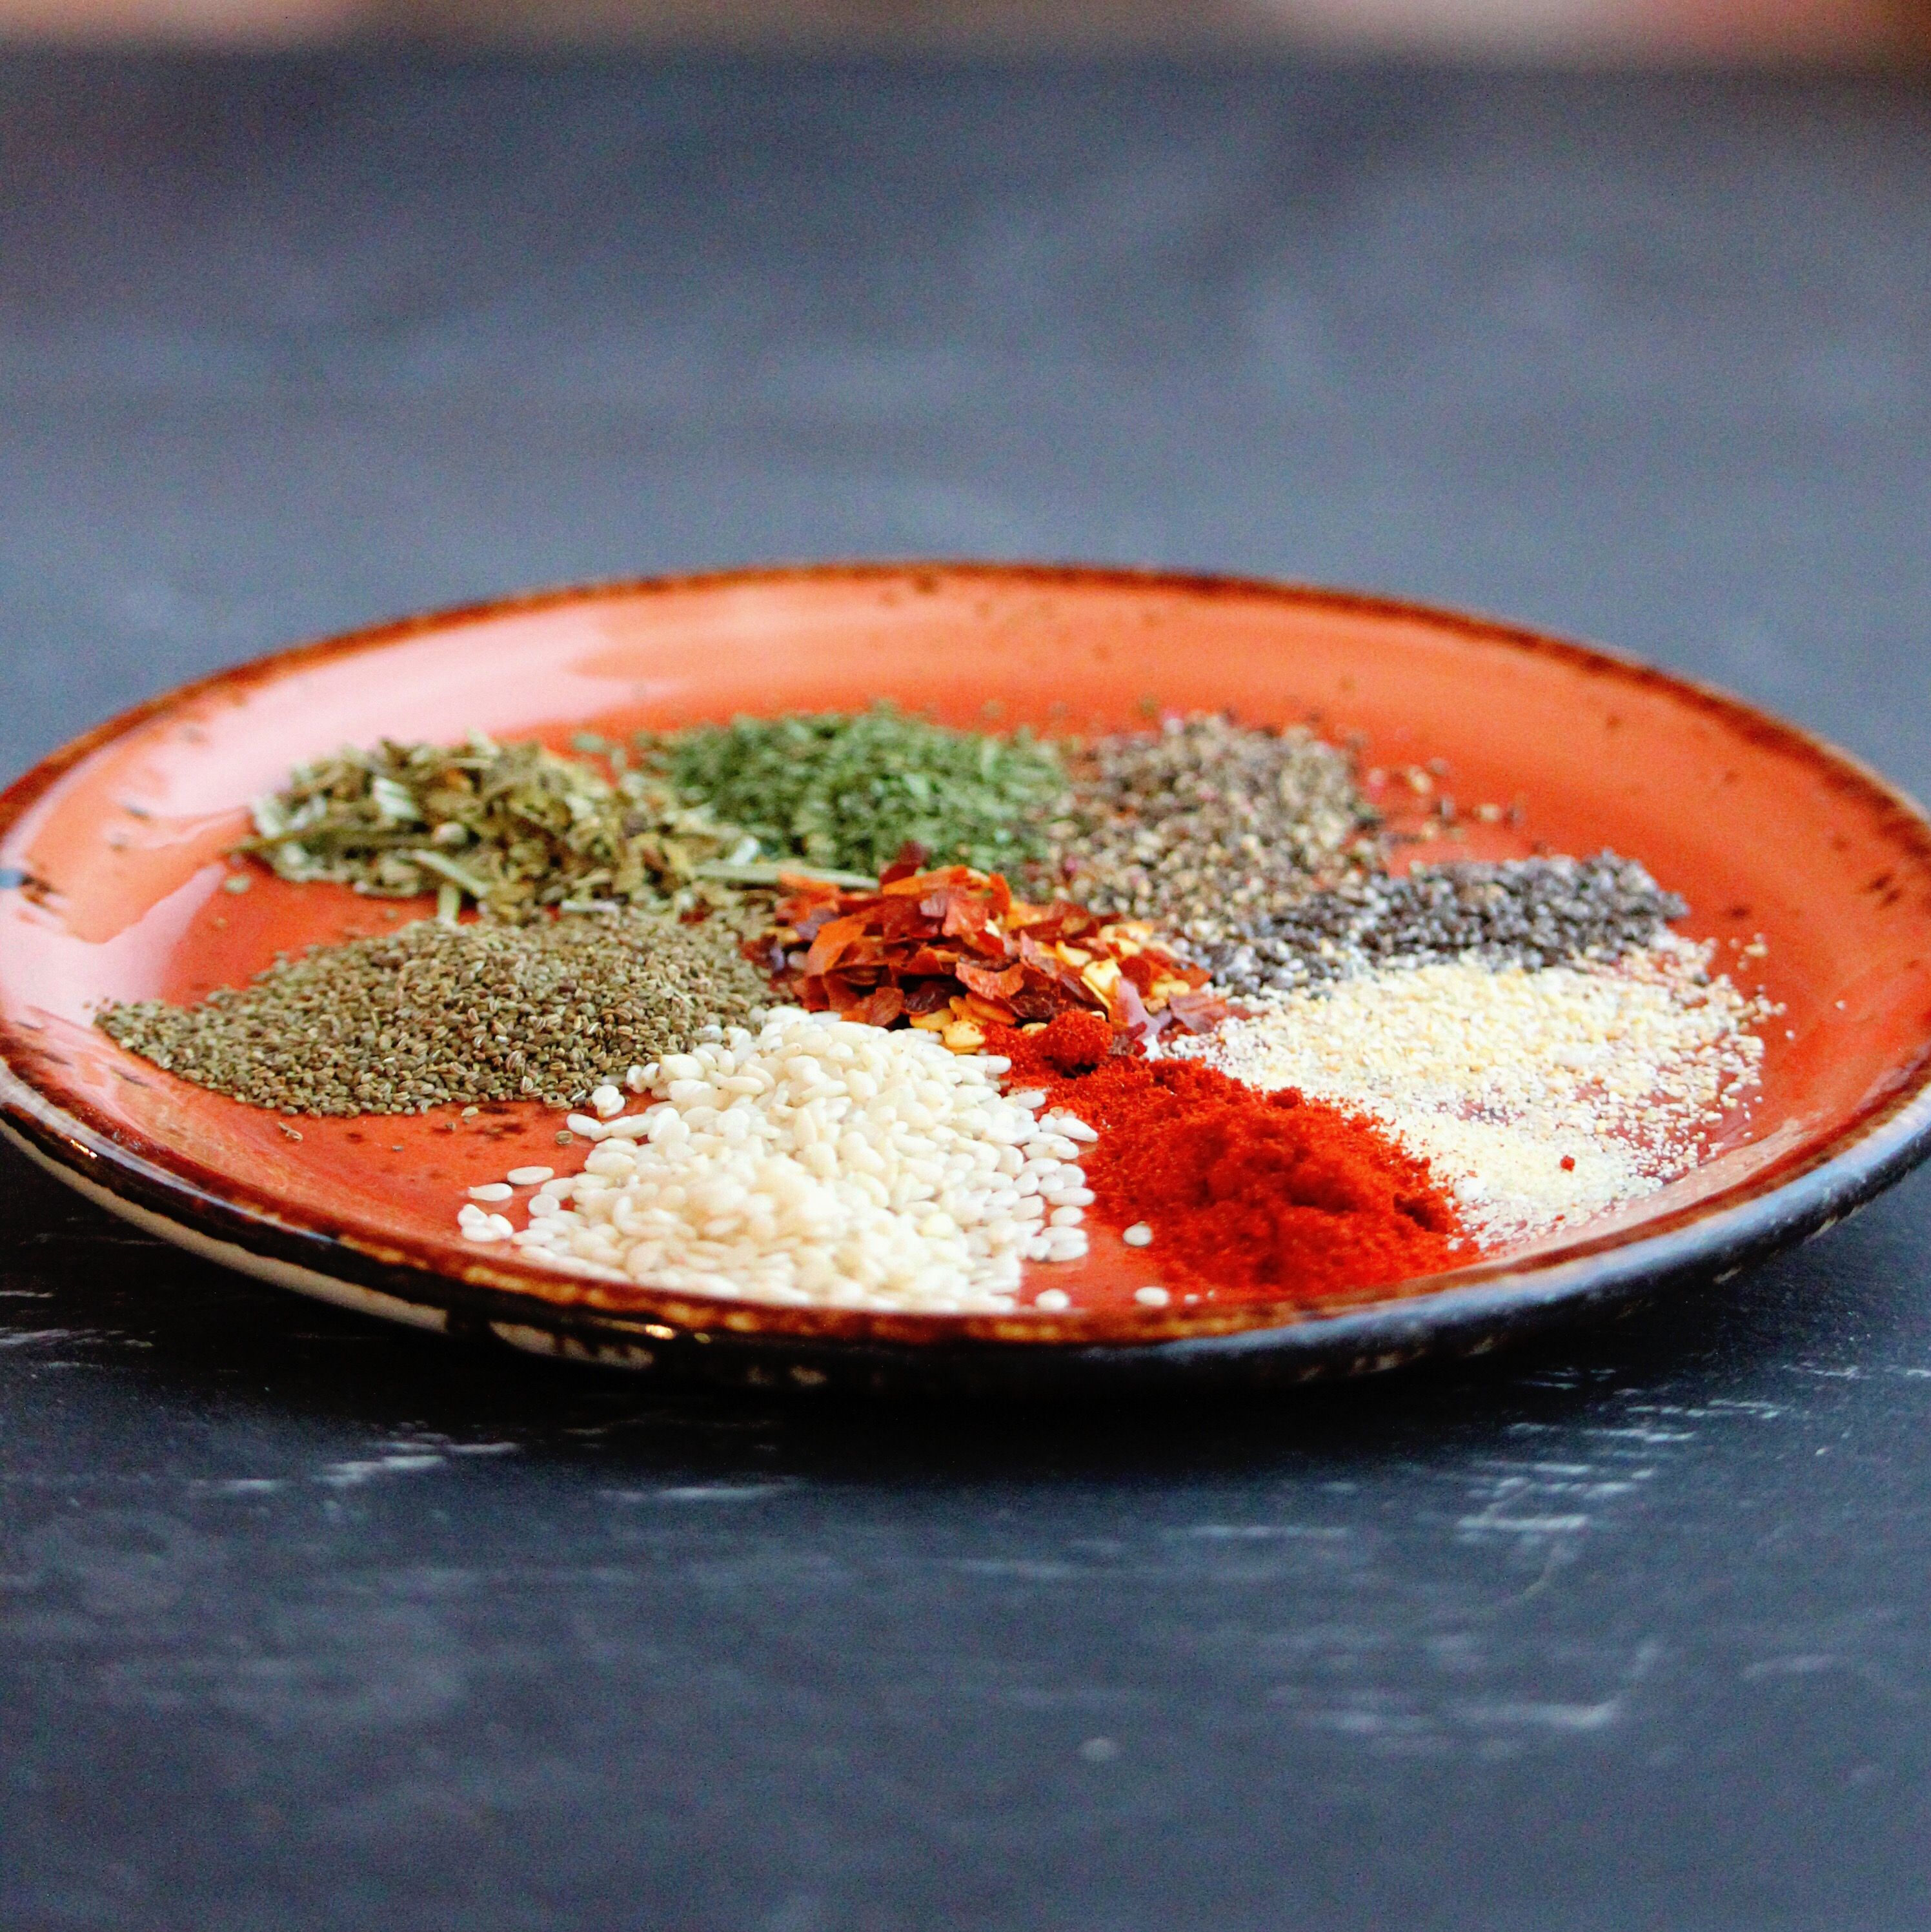 Salt-Free Spicy Herb Seasoning Blend Christina